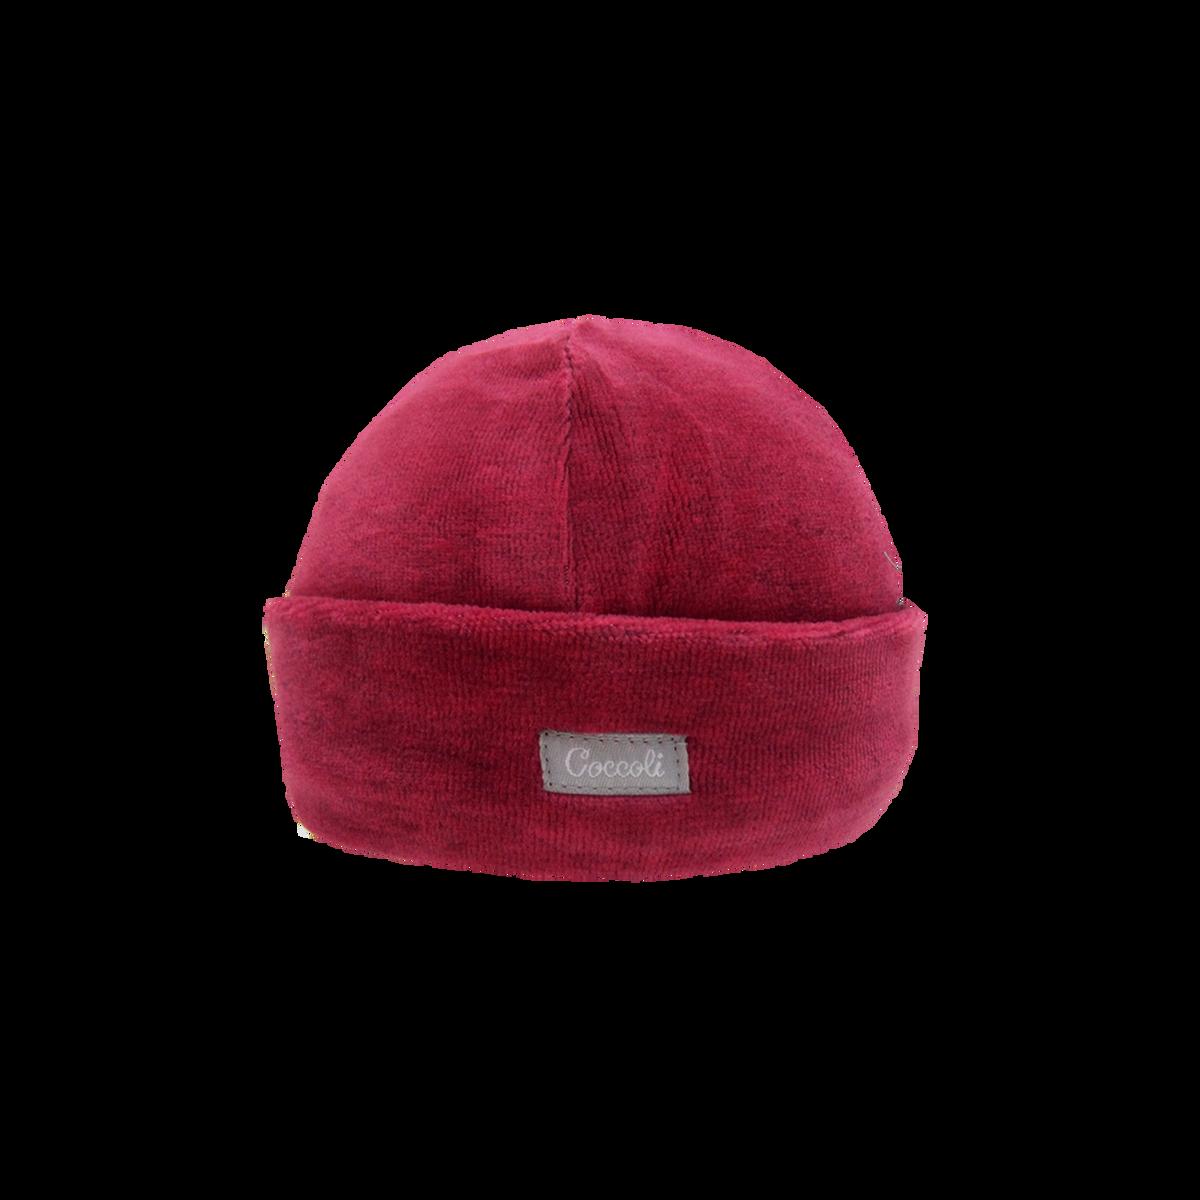 Coccoli Velour | Cap | N/1 - 9/12m | B3924-364